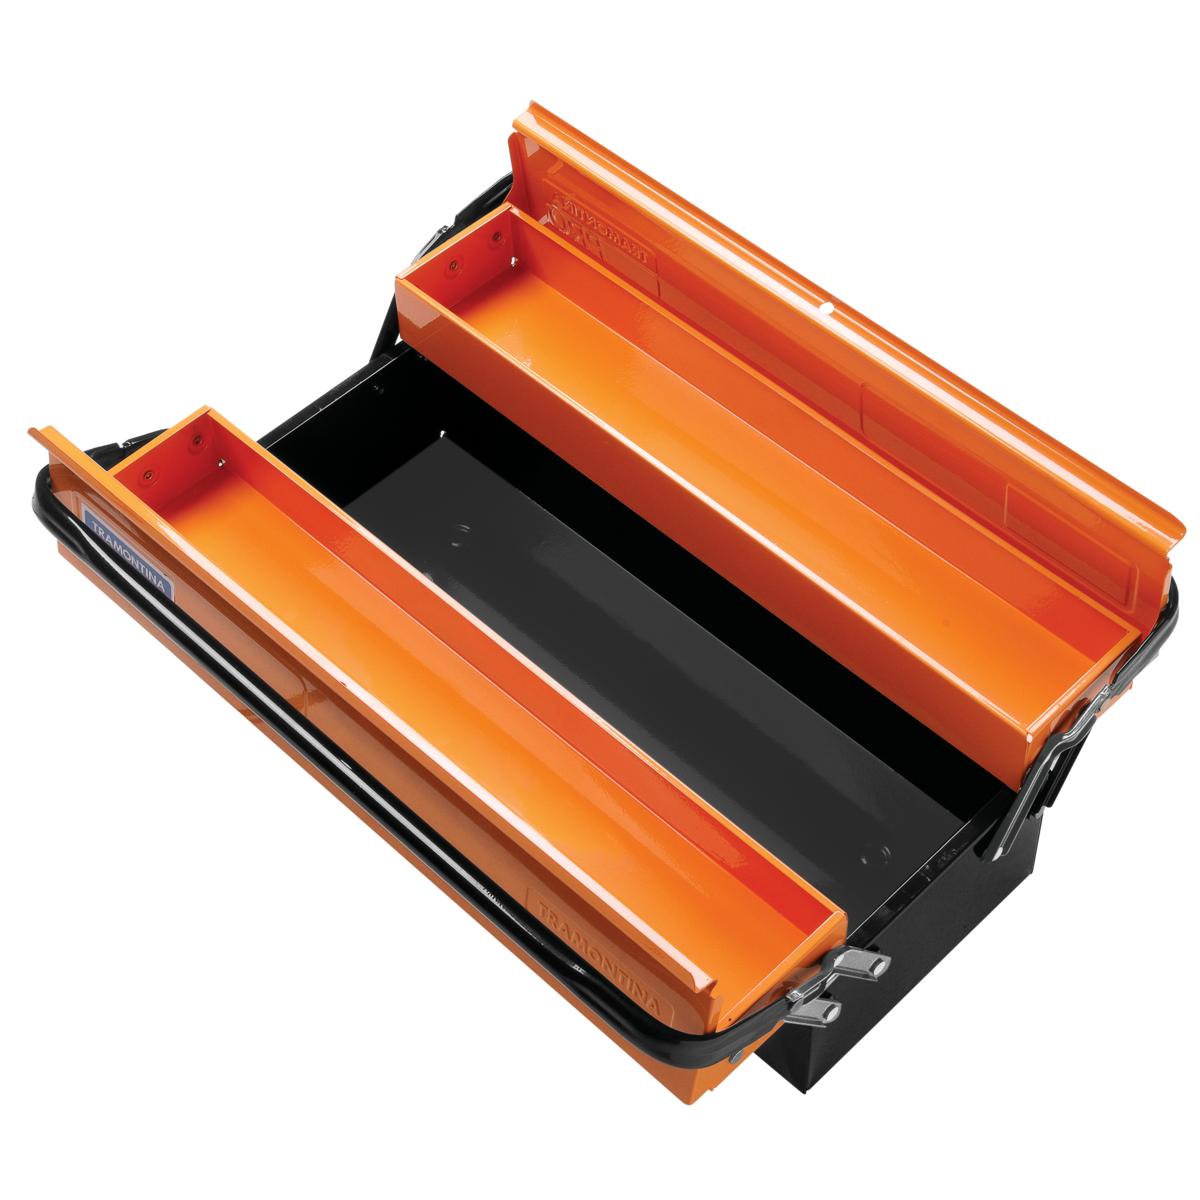 Tramontina - Caja porta herramientas 3 cajones 40c5991ee465